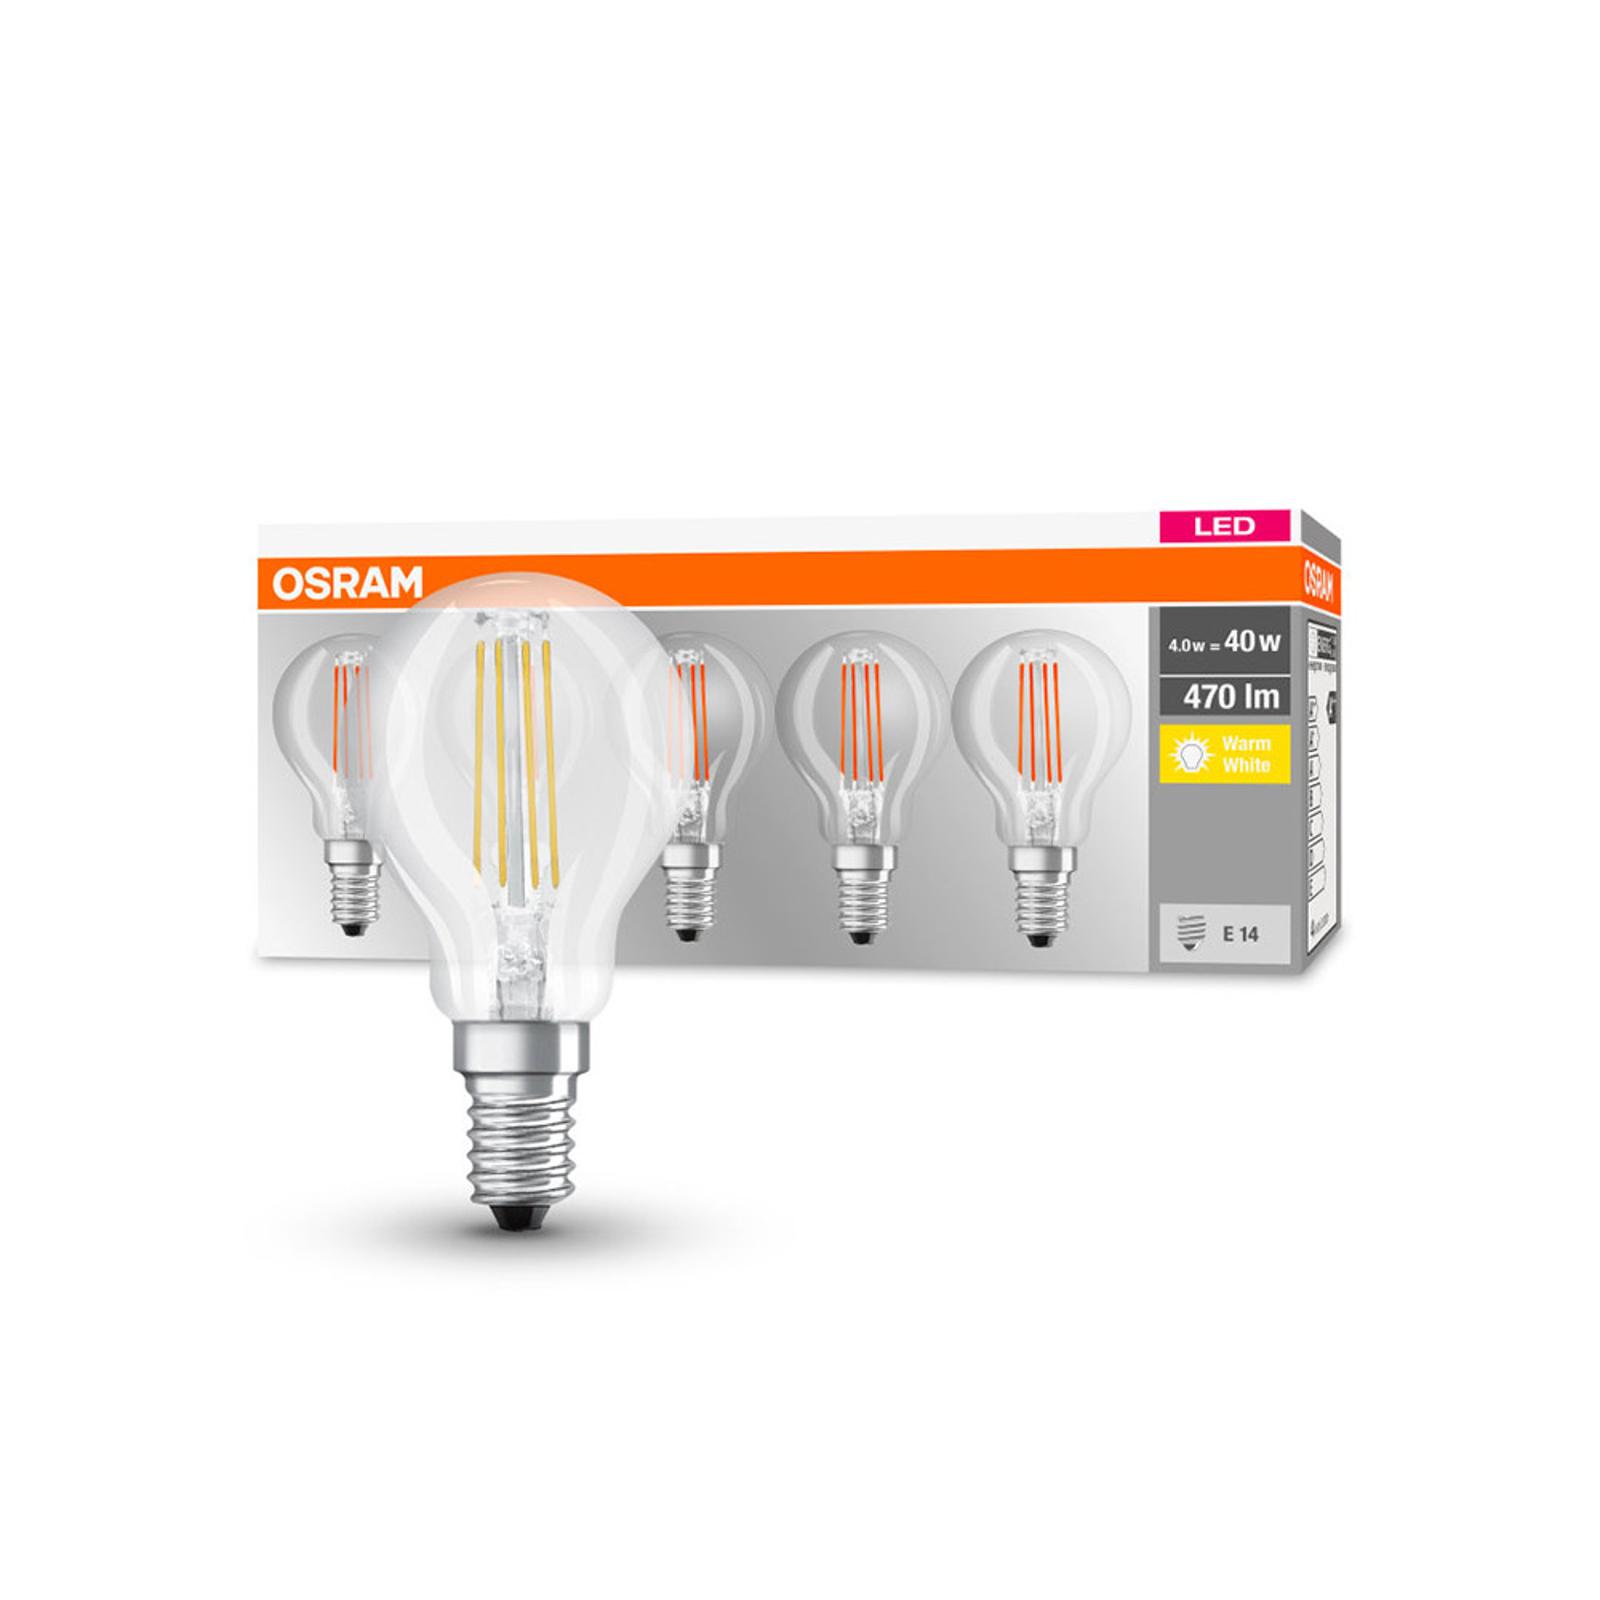 OSRAM żarówka E14 P40 4W filament 827 470lm 5 szt.